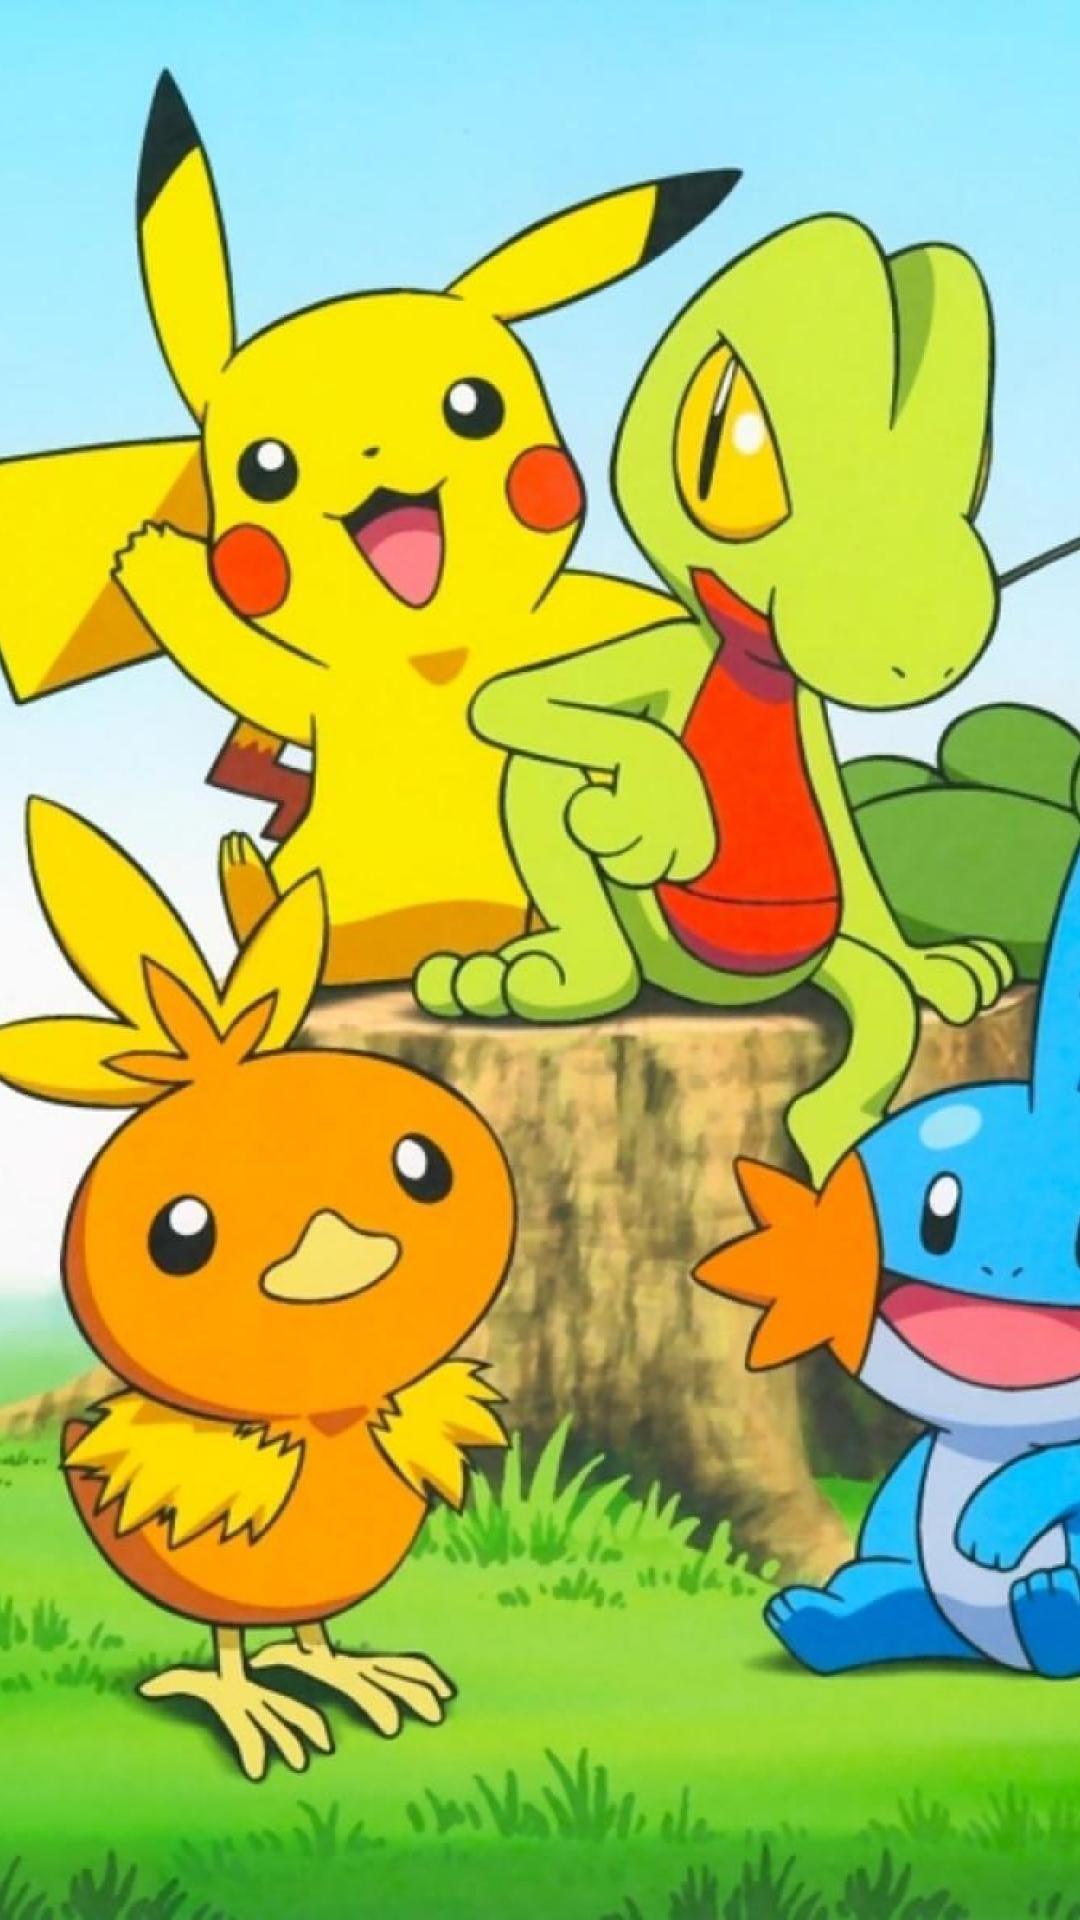 Pikachu HD wallpaper for iPhone